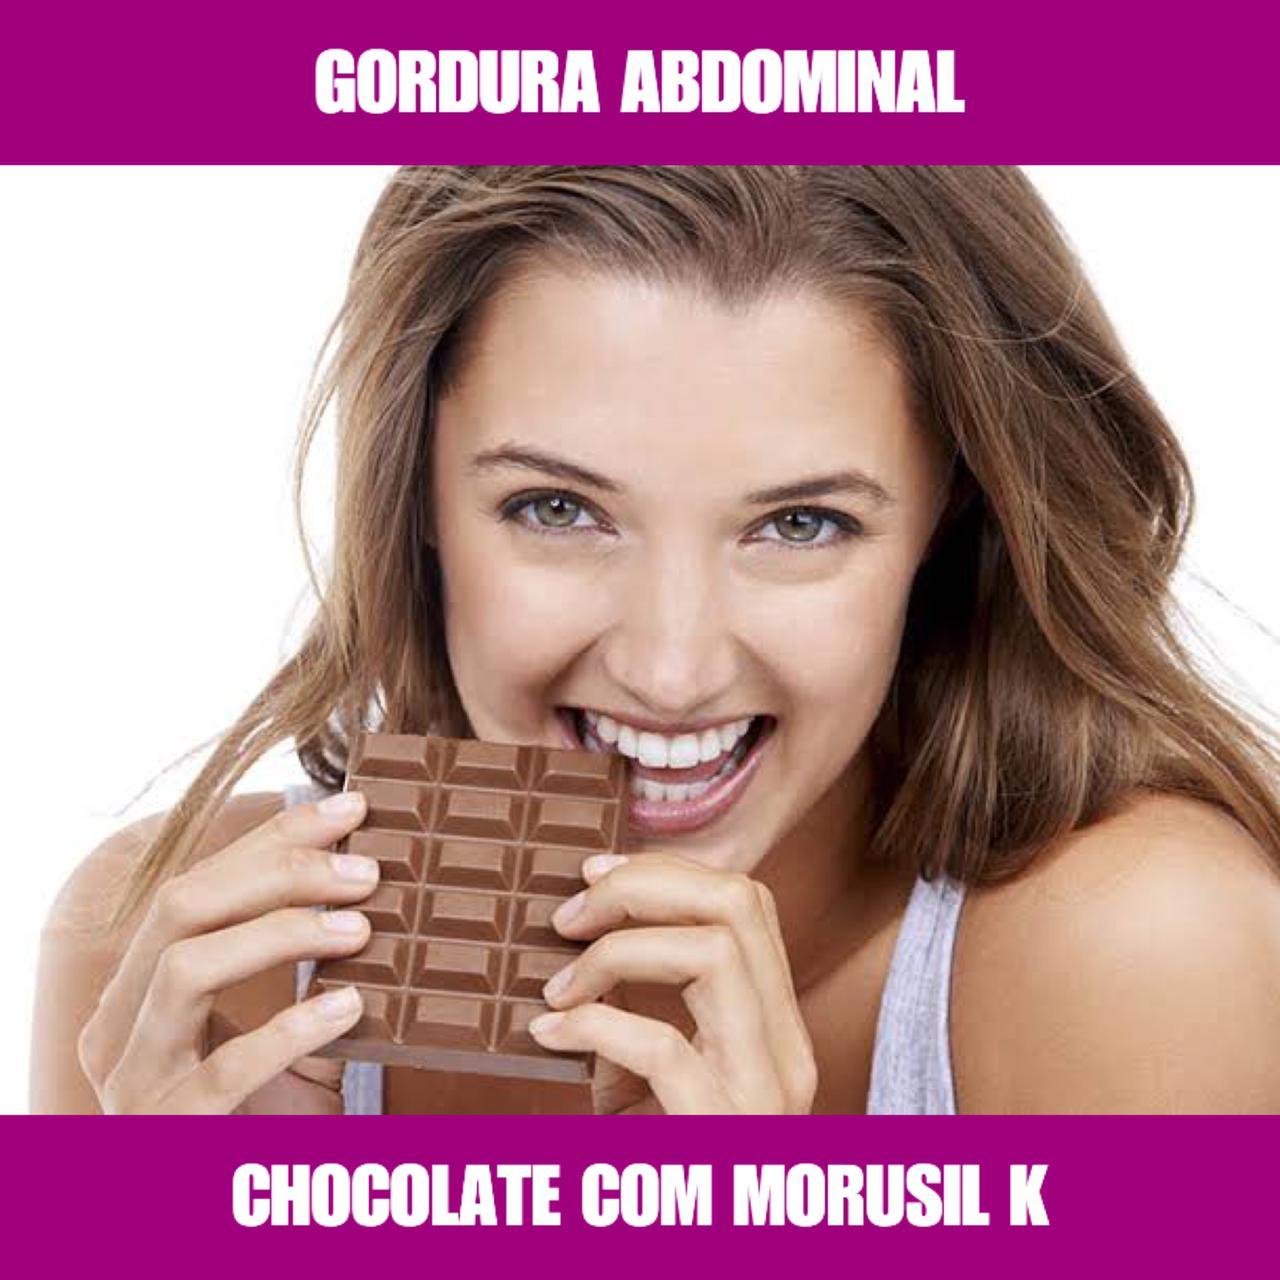 CHOCOLATE COM MORUSIL K - GORDURA ABDOMINAL